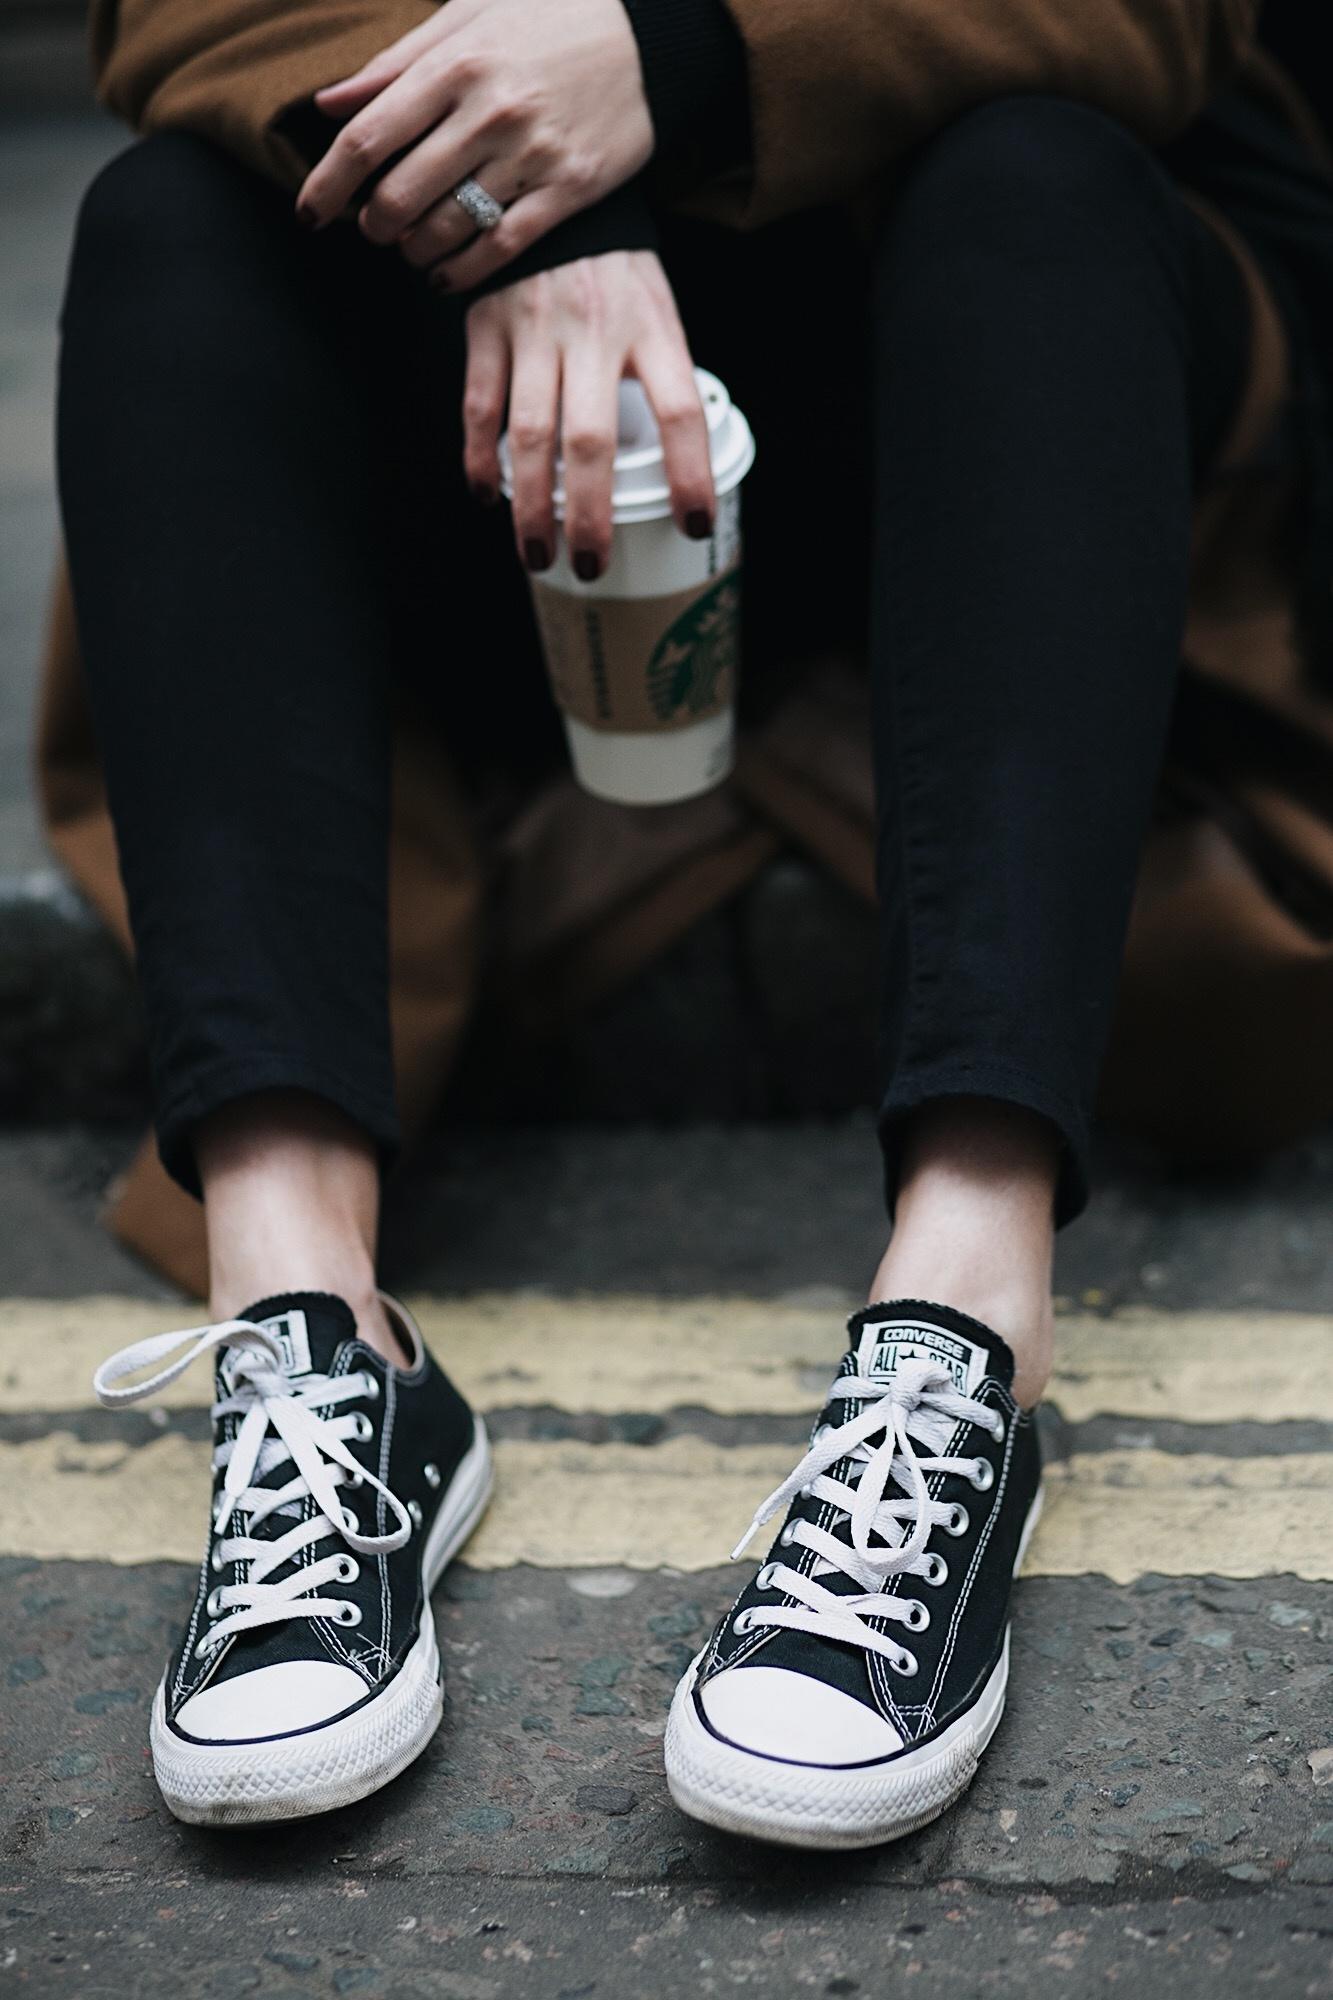 EJ STYLE - Black skinny jeans, black low Converse